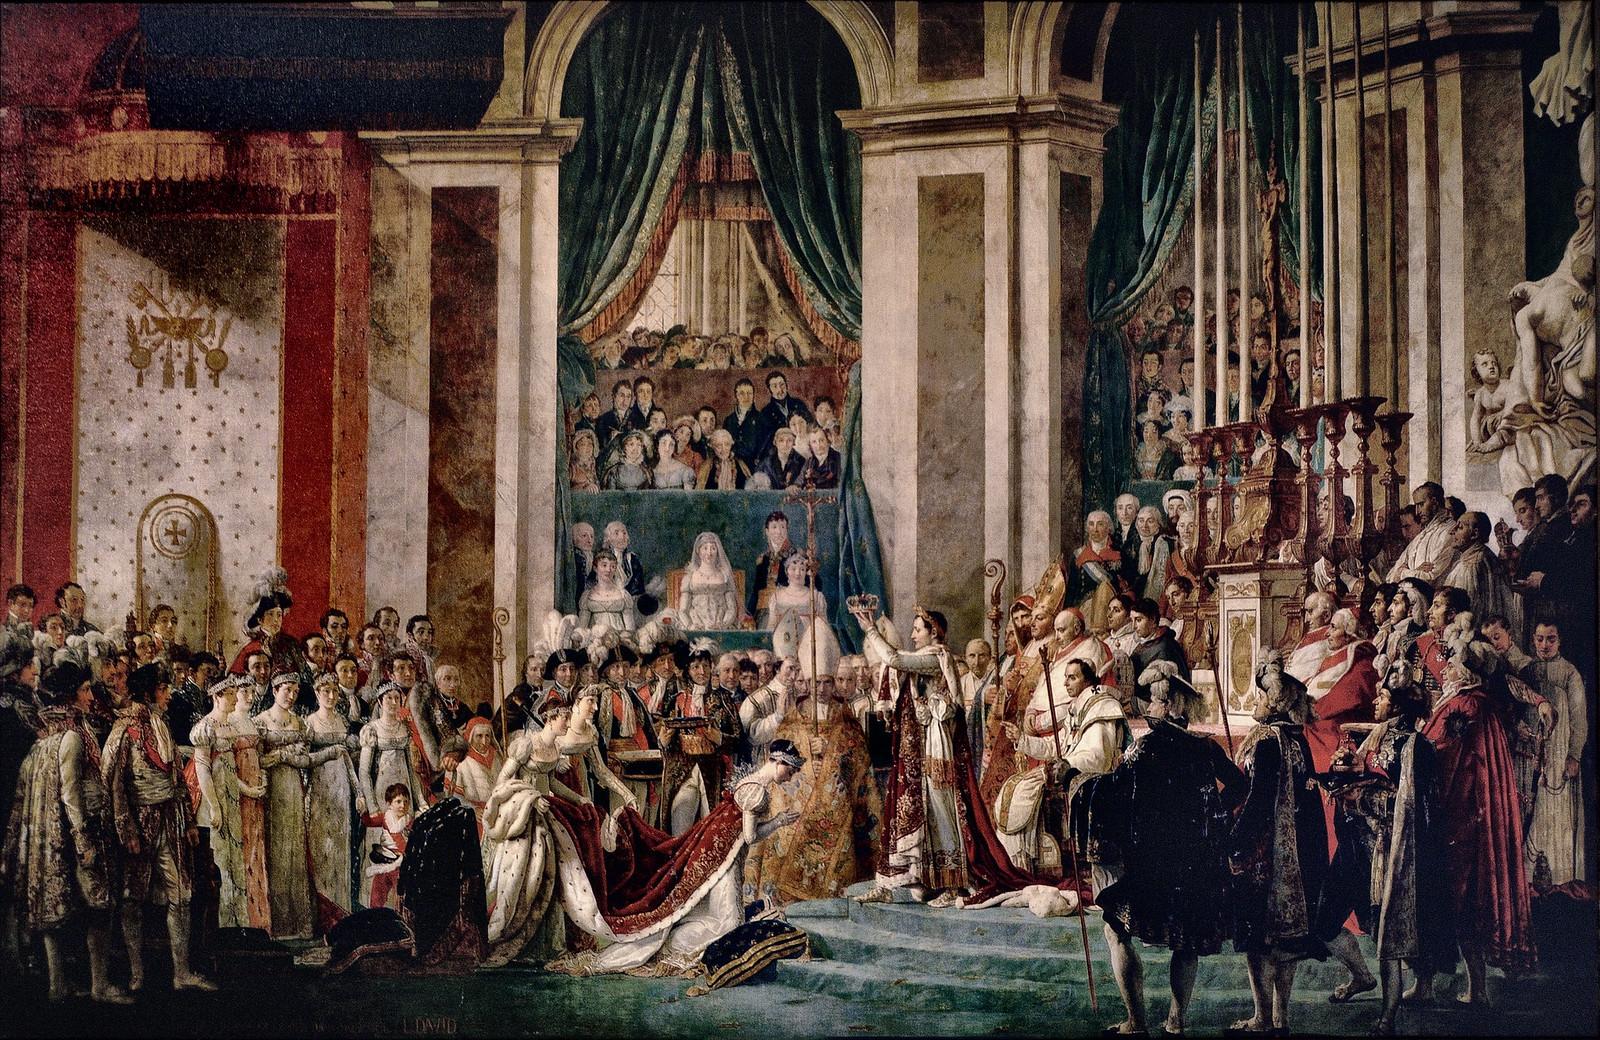 Коронация Наполеона. Жак Луи Давид